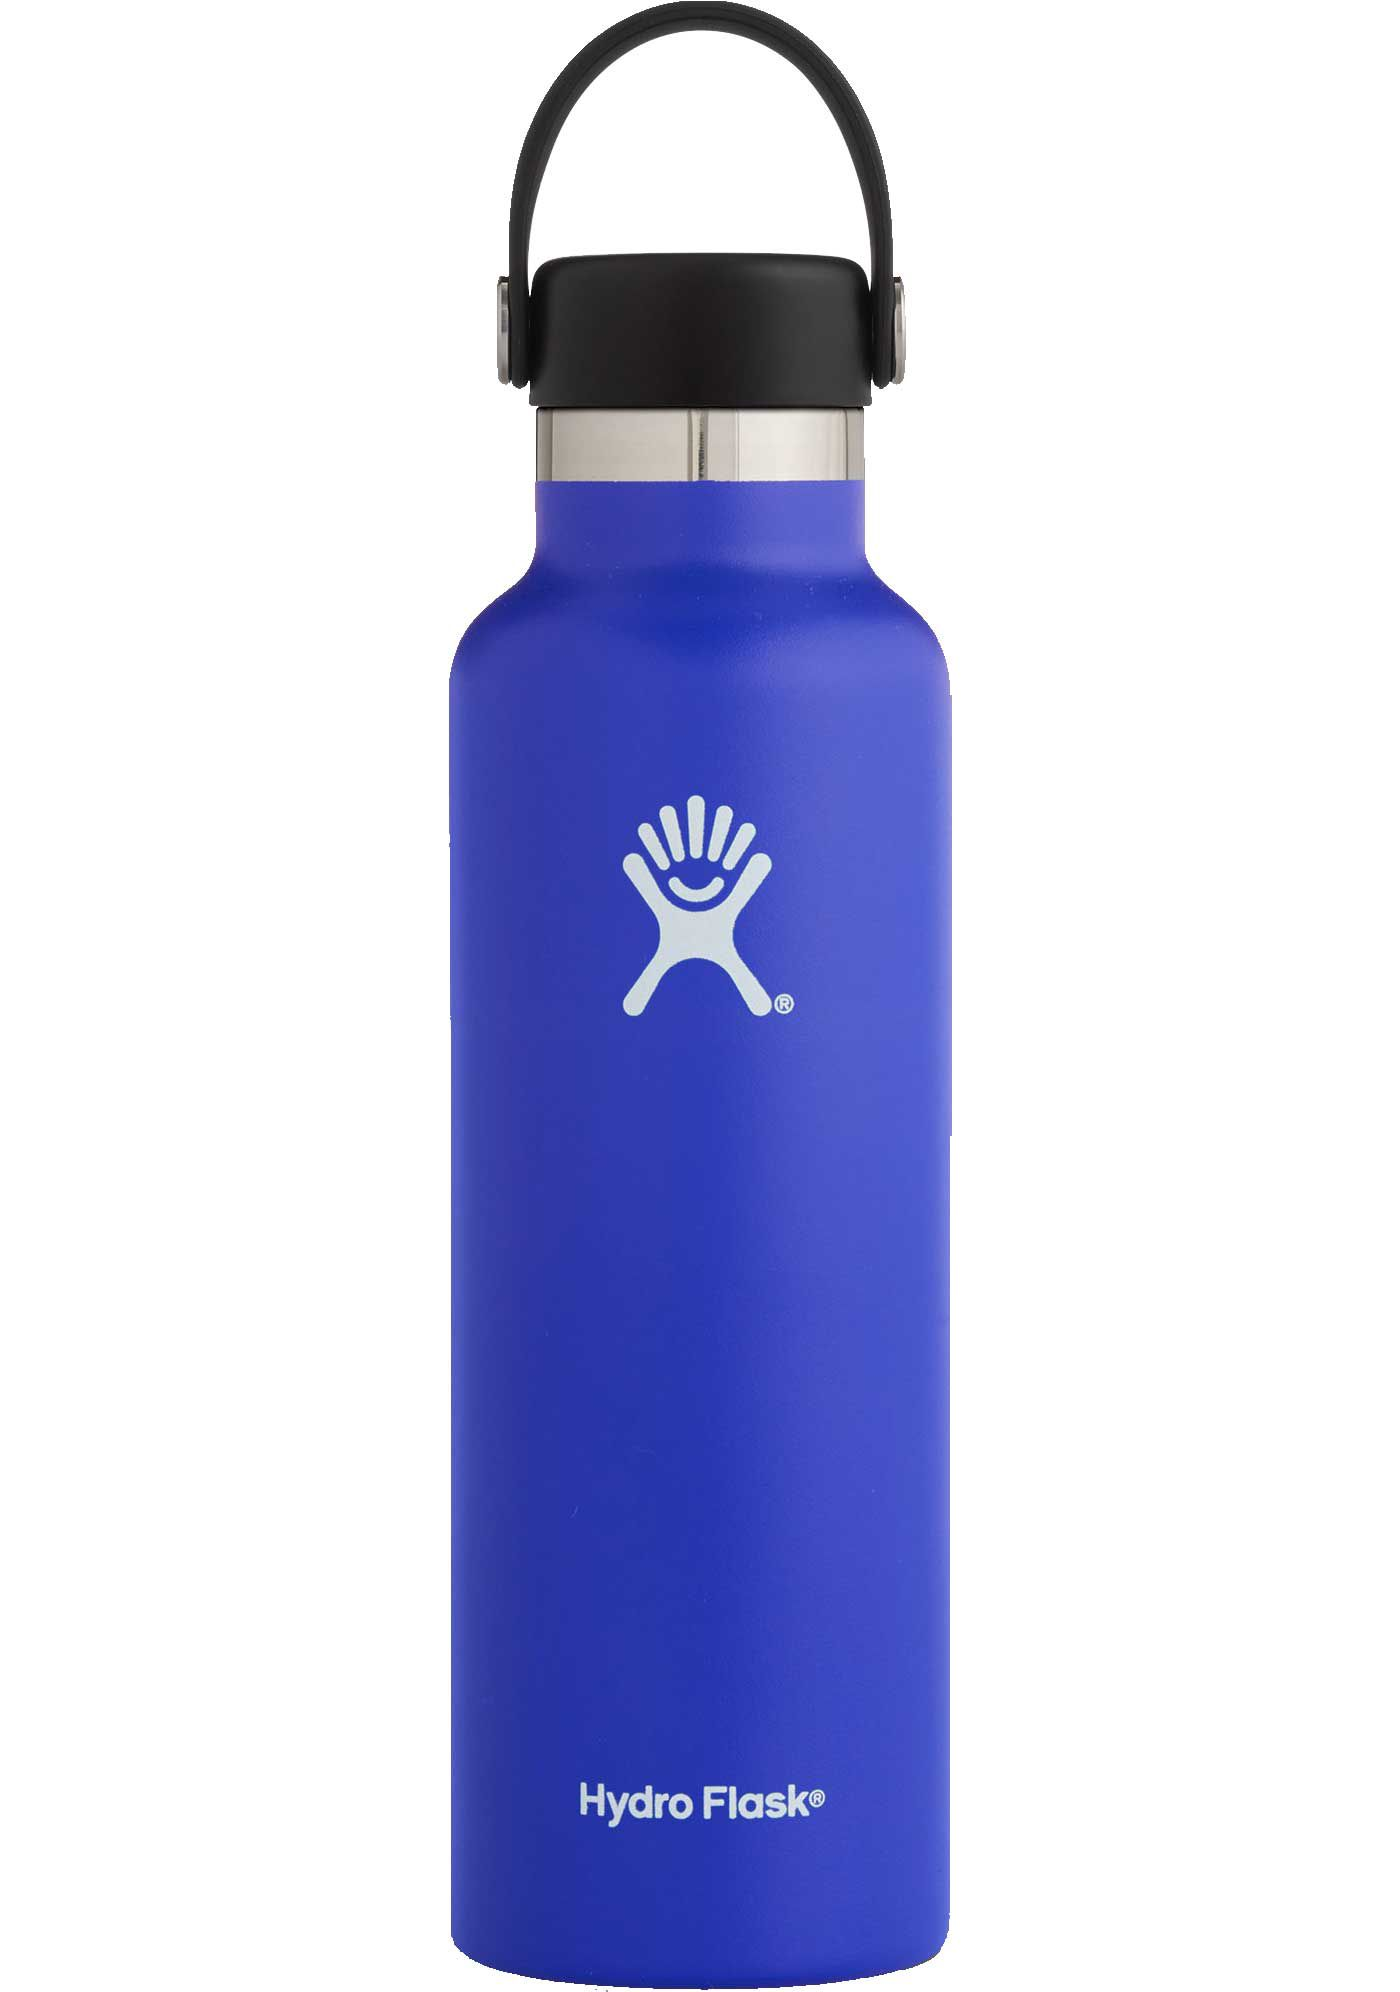 Hydro Flask Standard Mouth 21 oz. Bottle with Flex Cap